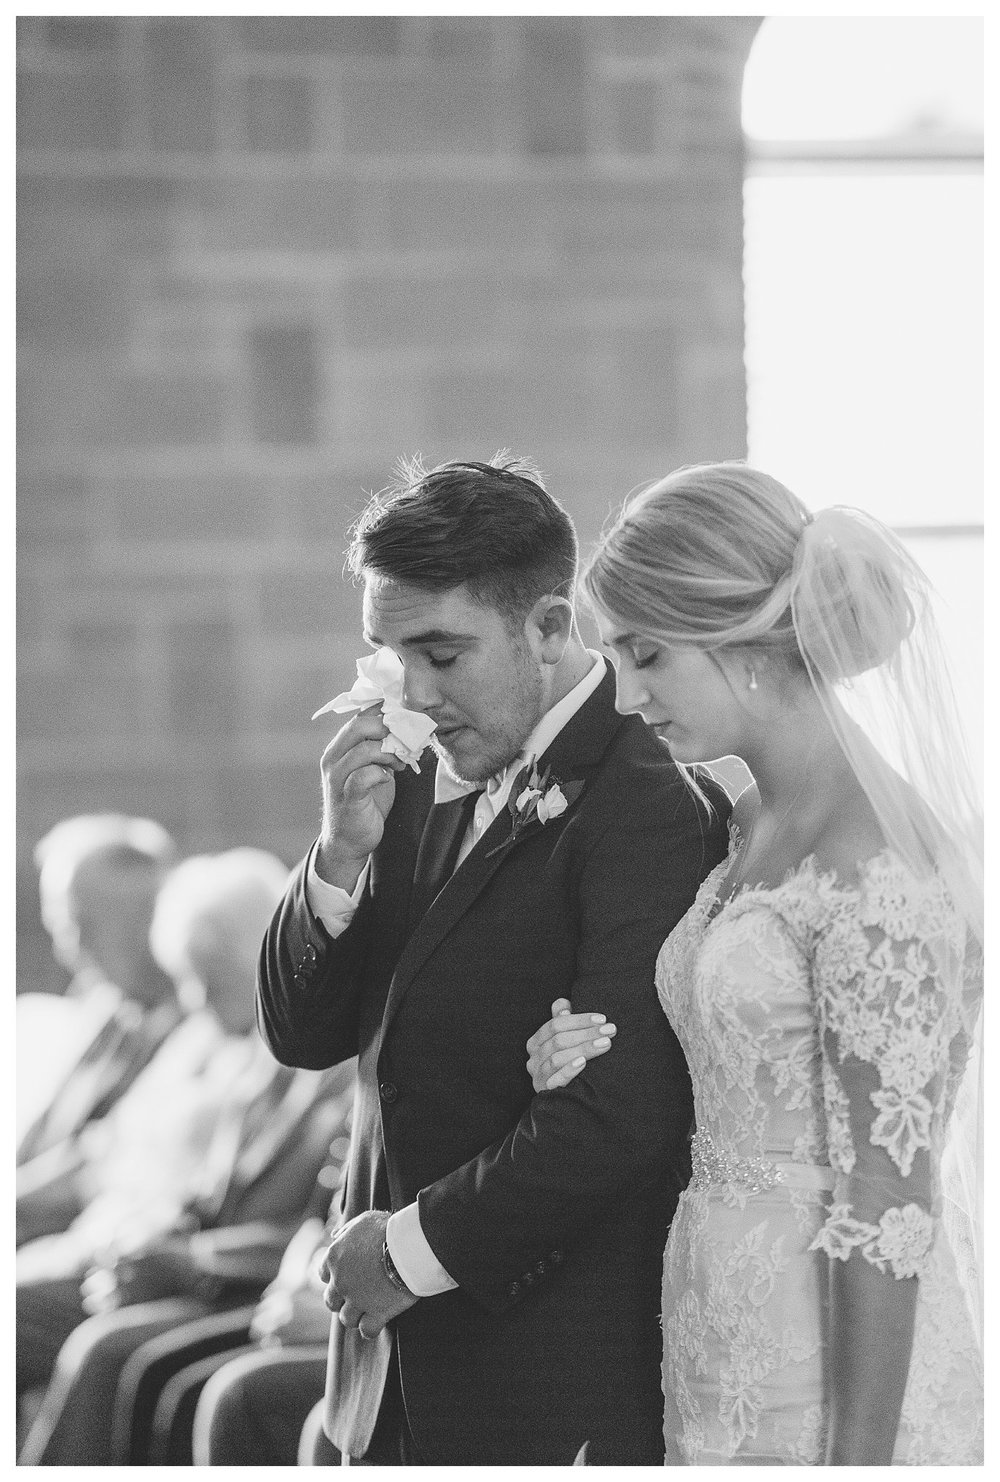 tower-park-mess-hall-everleigh-photography-northern-kentucky-wedding-photographer-67